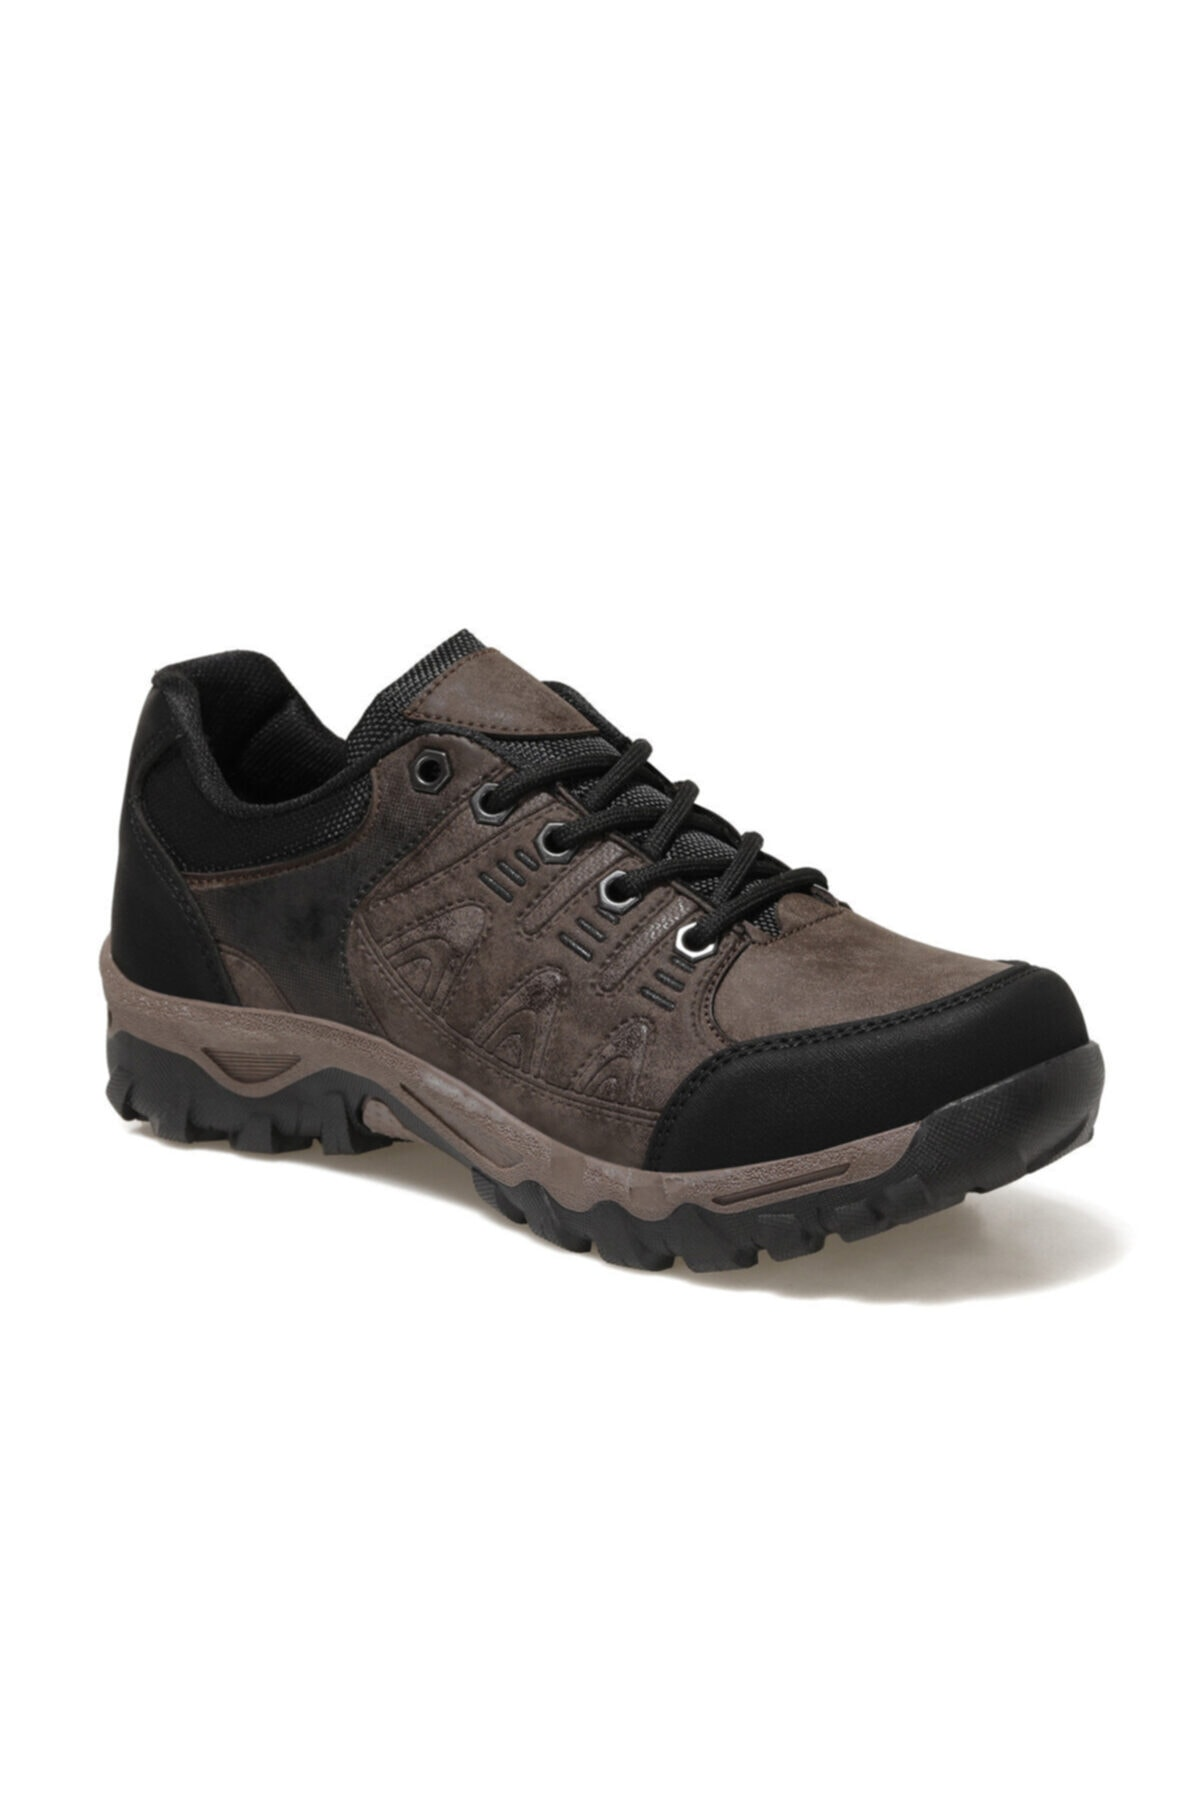 Shake Kahverengi Erkek Outdoor Ayakkabı